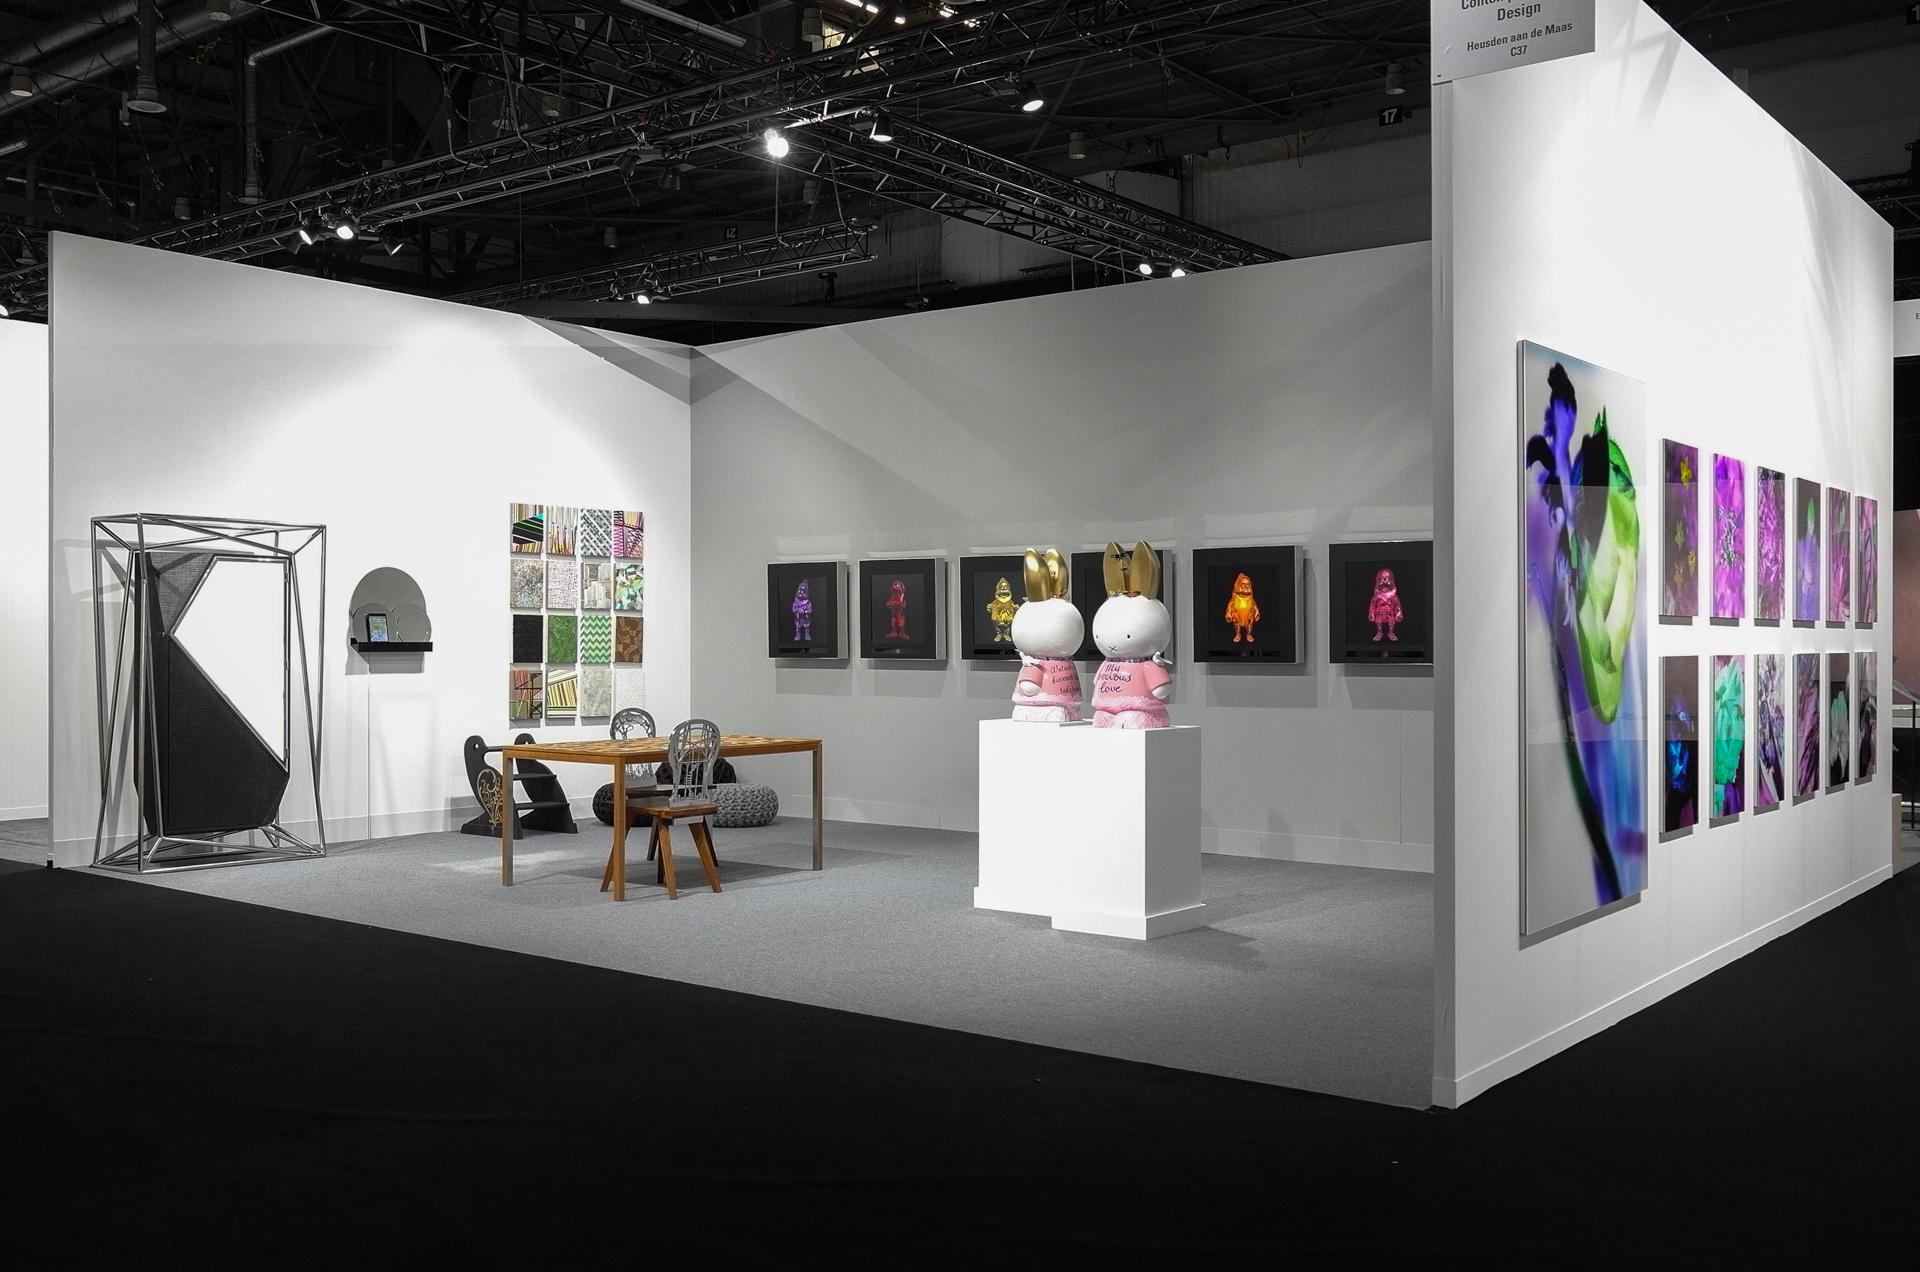 Design Events: PAD Geneva 2019 design eventsDesign Events: PAD Geneva 2019Artgen  ve2016 BoothC37 PRIVEEKOLLEKTIE 01